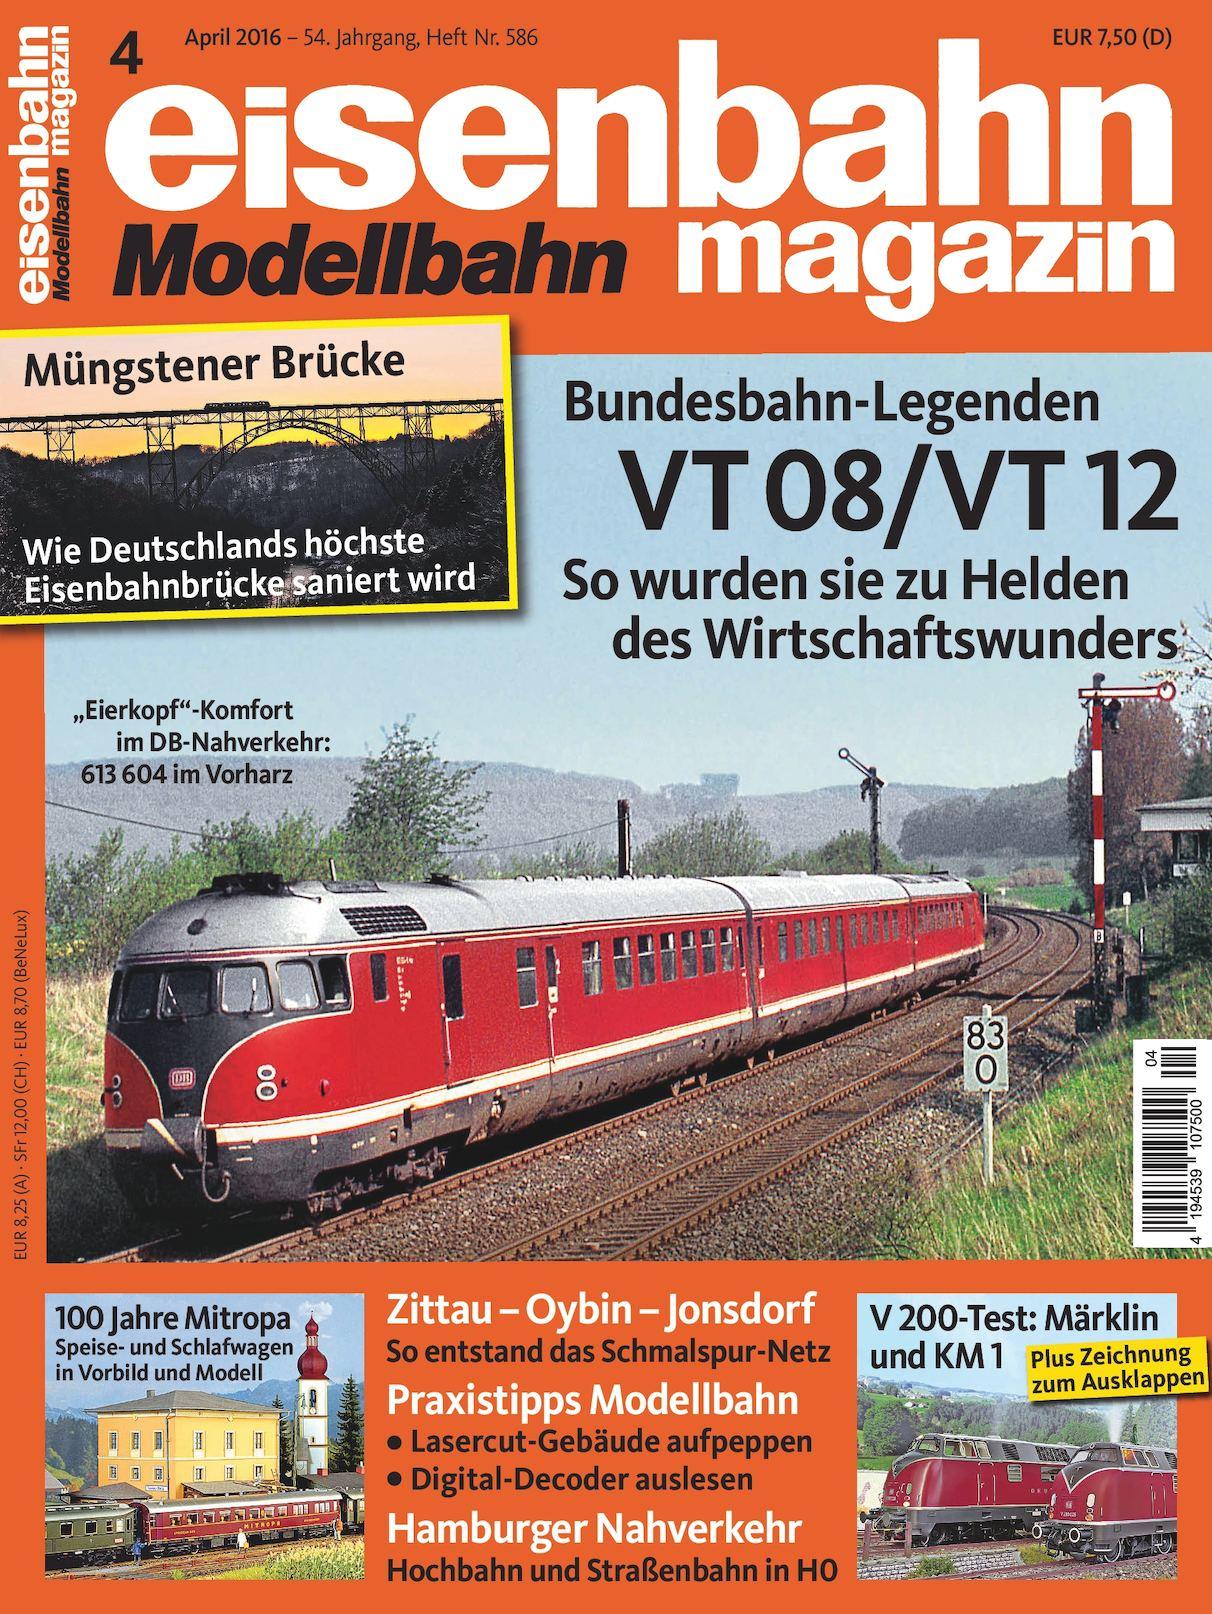 Eisenbahn Modellbahn Magazin 04 2016